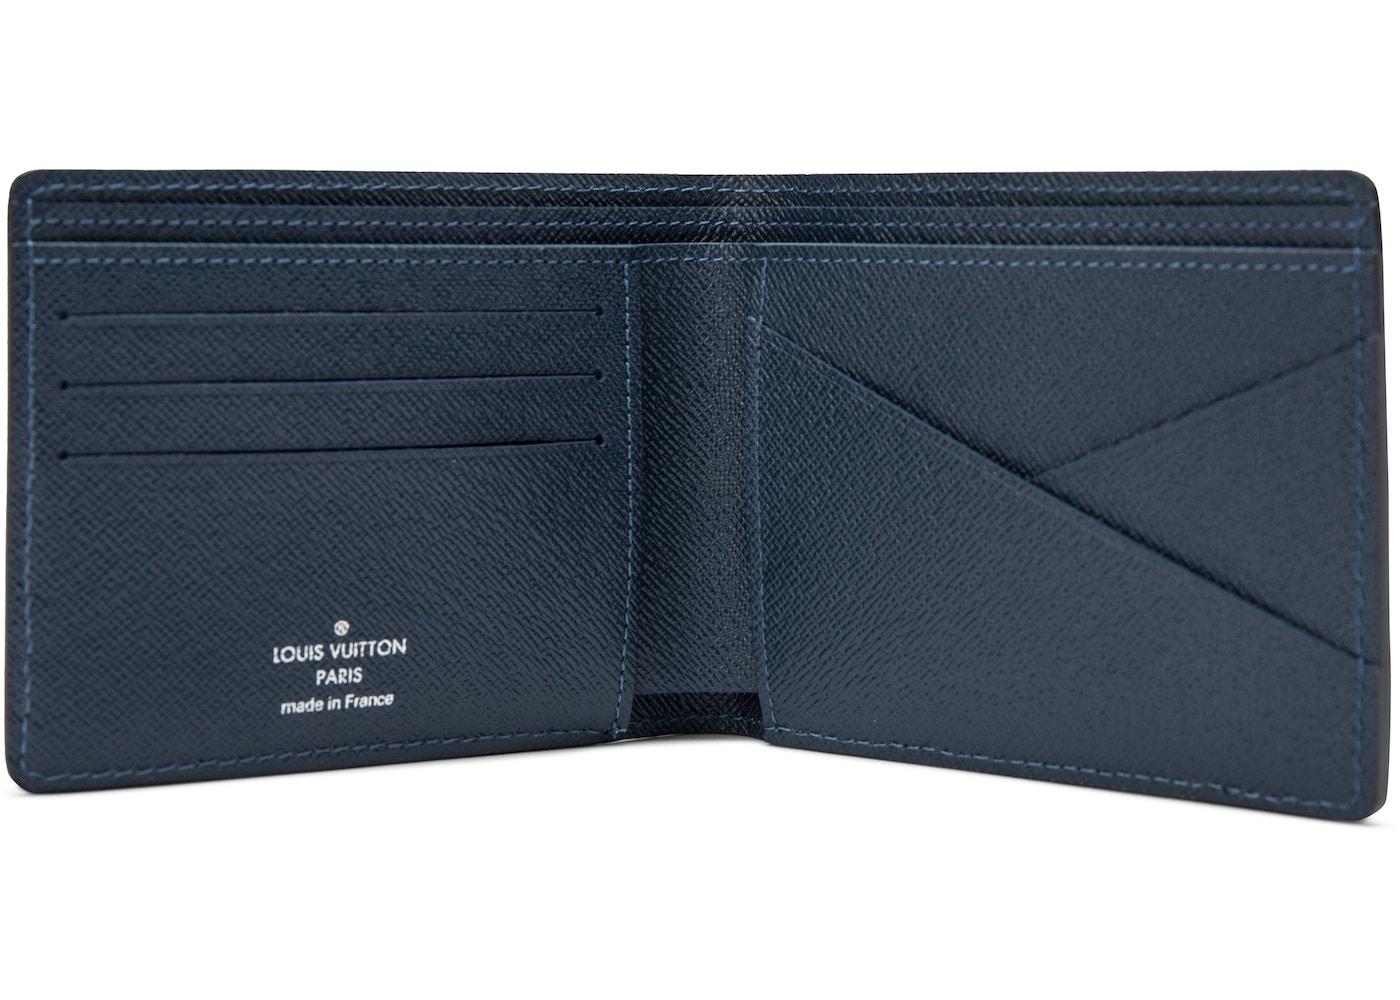 Louis Vuitton #29356 Black Epi Leather Bifold Classic